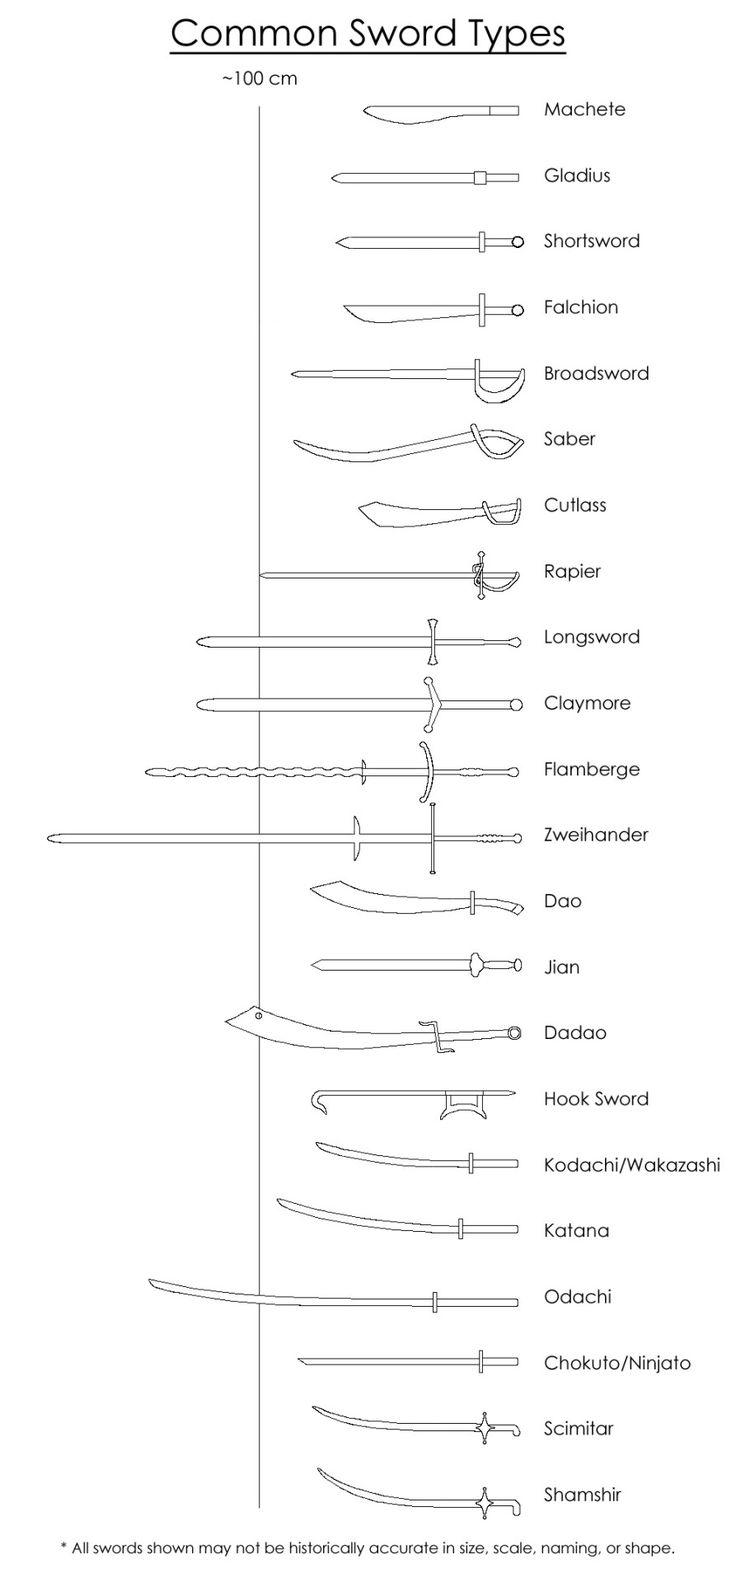 "primus-pilus: "" http://the-8-elements.deviantart.com/art/Common-Sword-Types-290730689 """